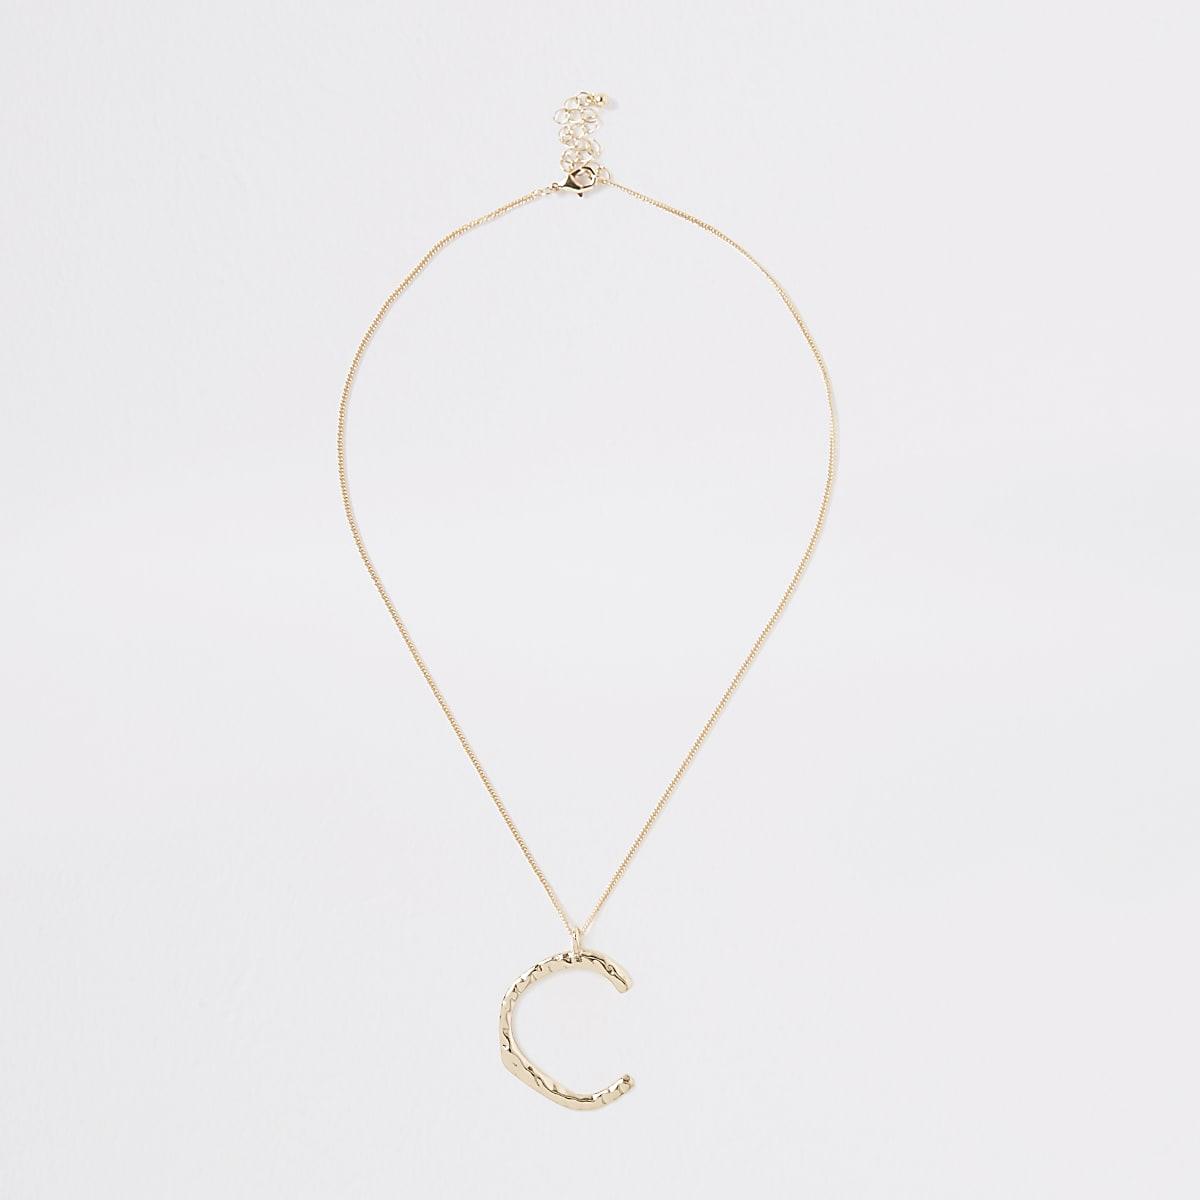 Gold colour large initial 'C' necklace